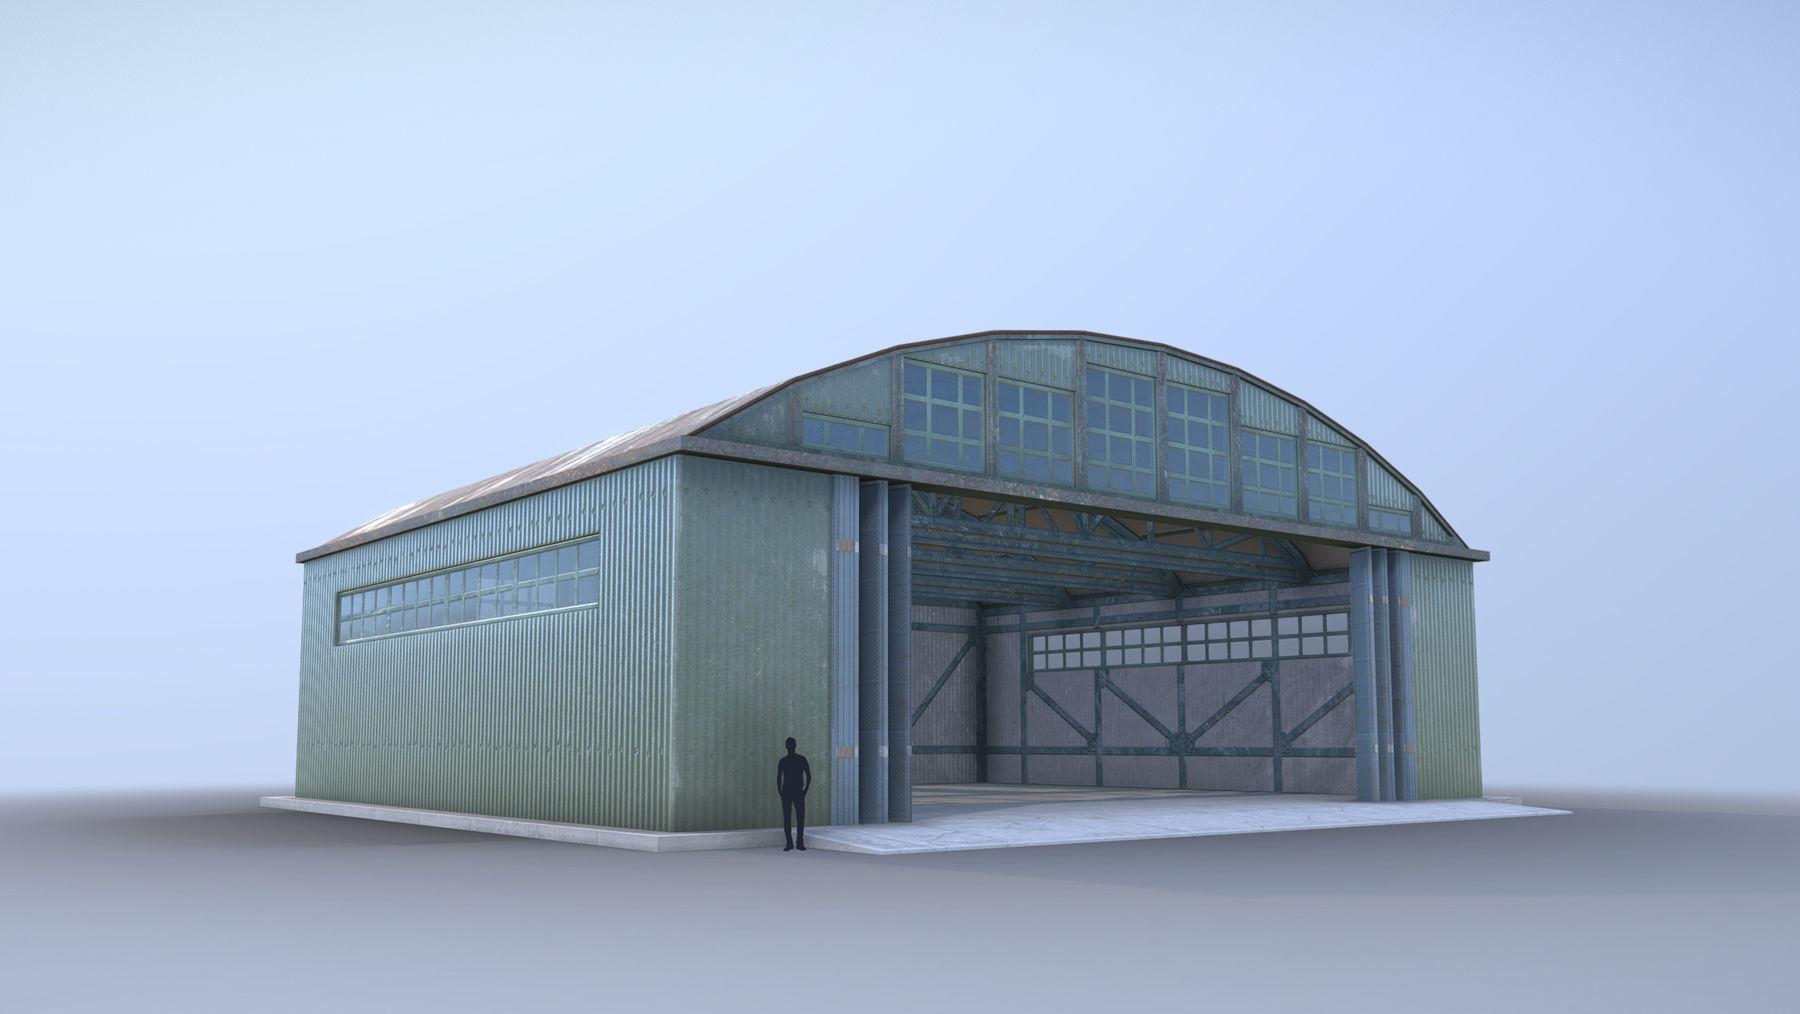 Airport Hangar SmallHangar 01 open